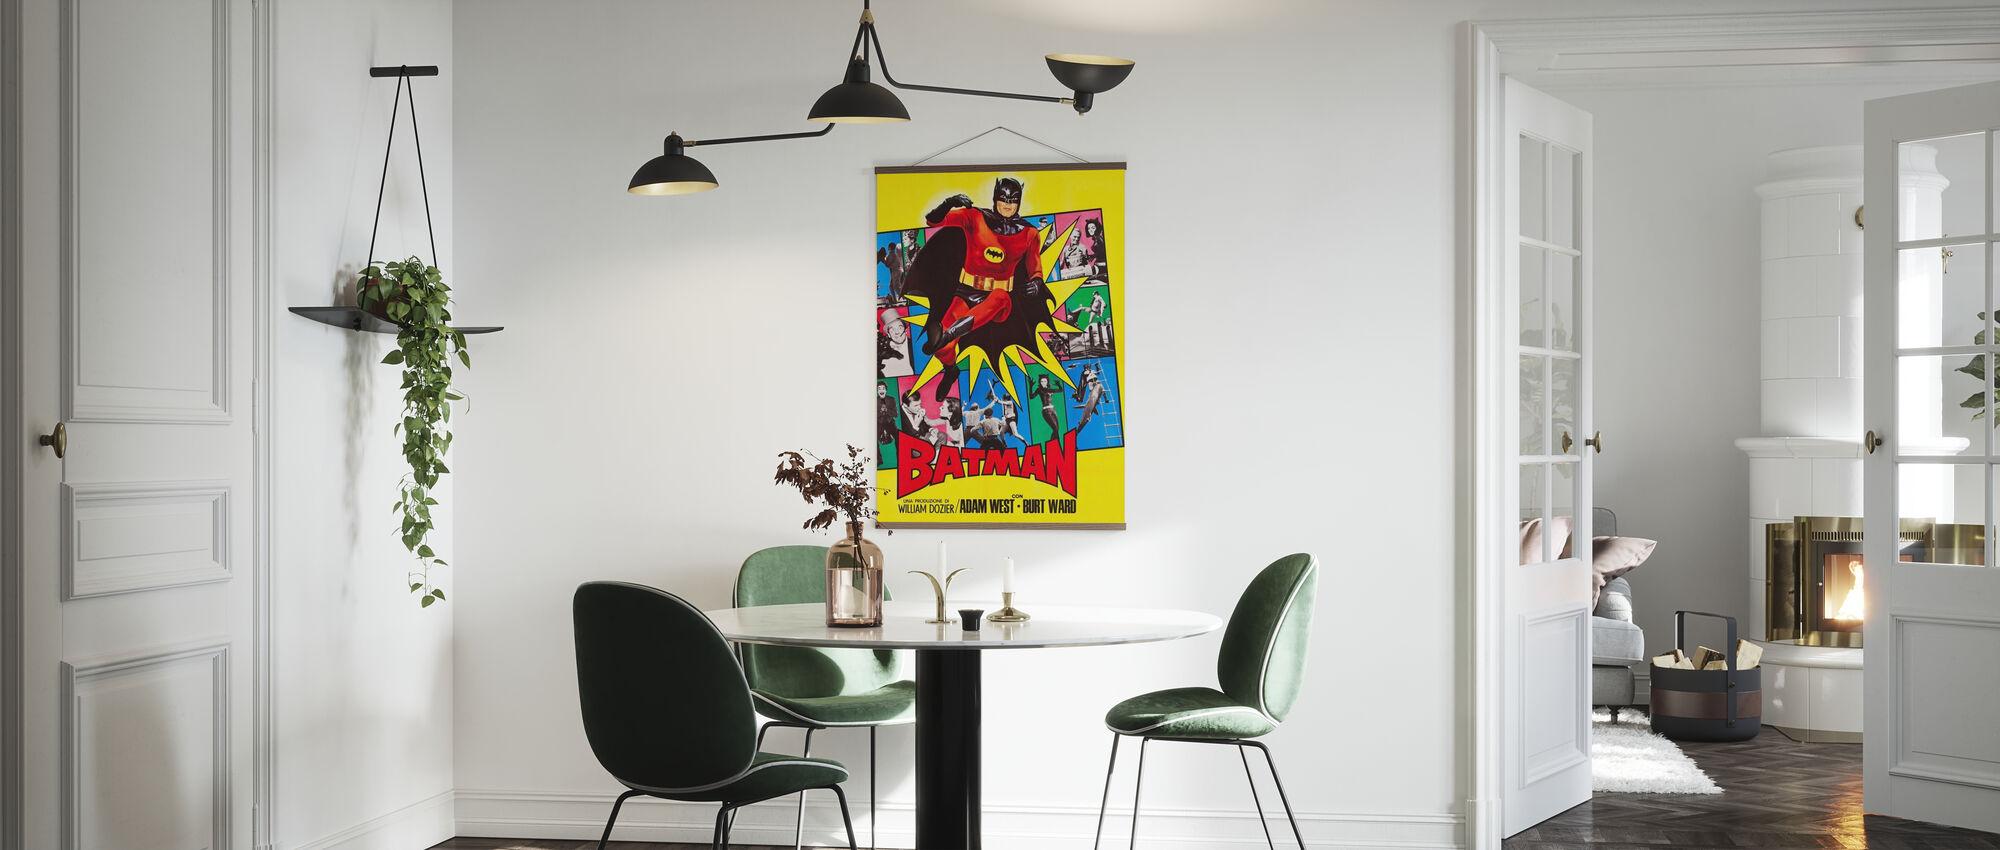 Batman II - Poster - Kitchen